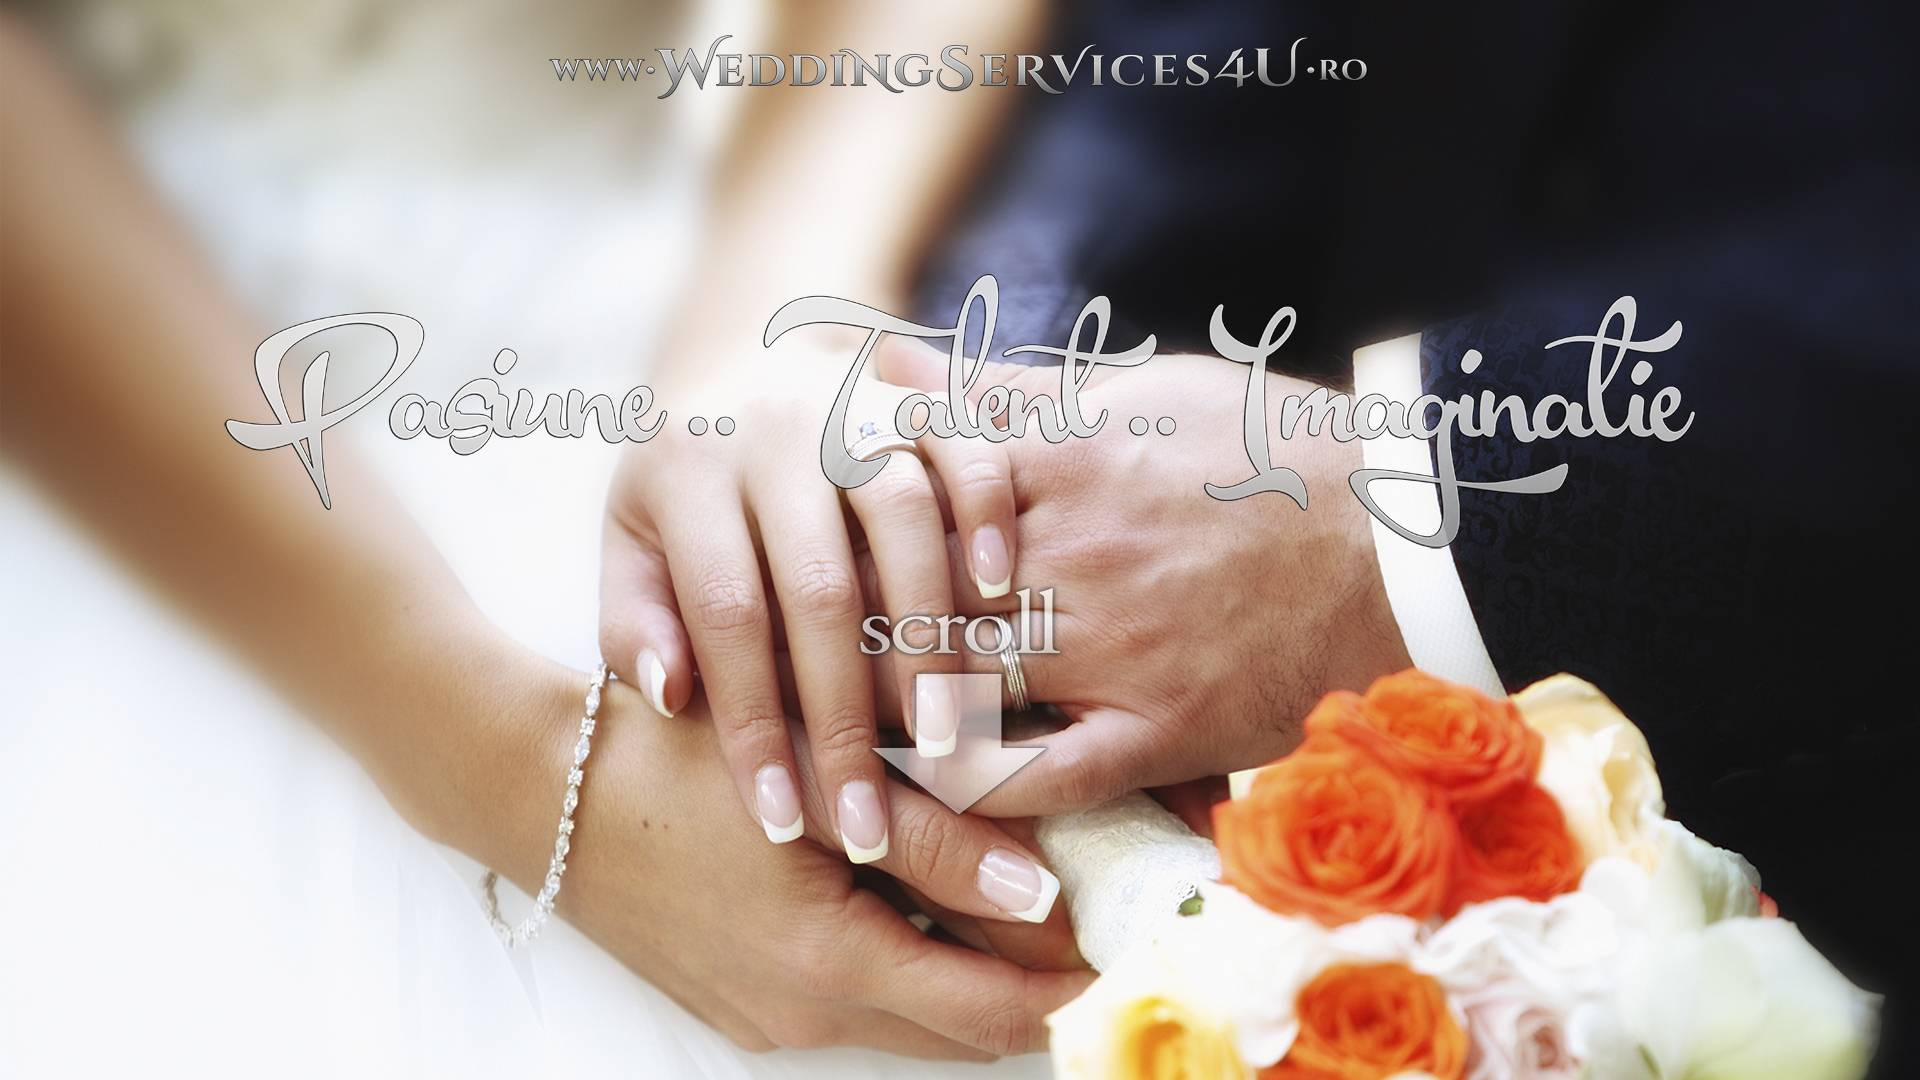 WeddingServices4U.ro Servicii Foto Video pentru Nunta si Botez, Filmari Profesionale 4K si FullHD, Montaj Video, Macara, Drona, Servicii de Imagine